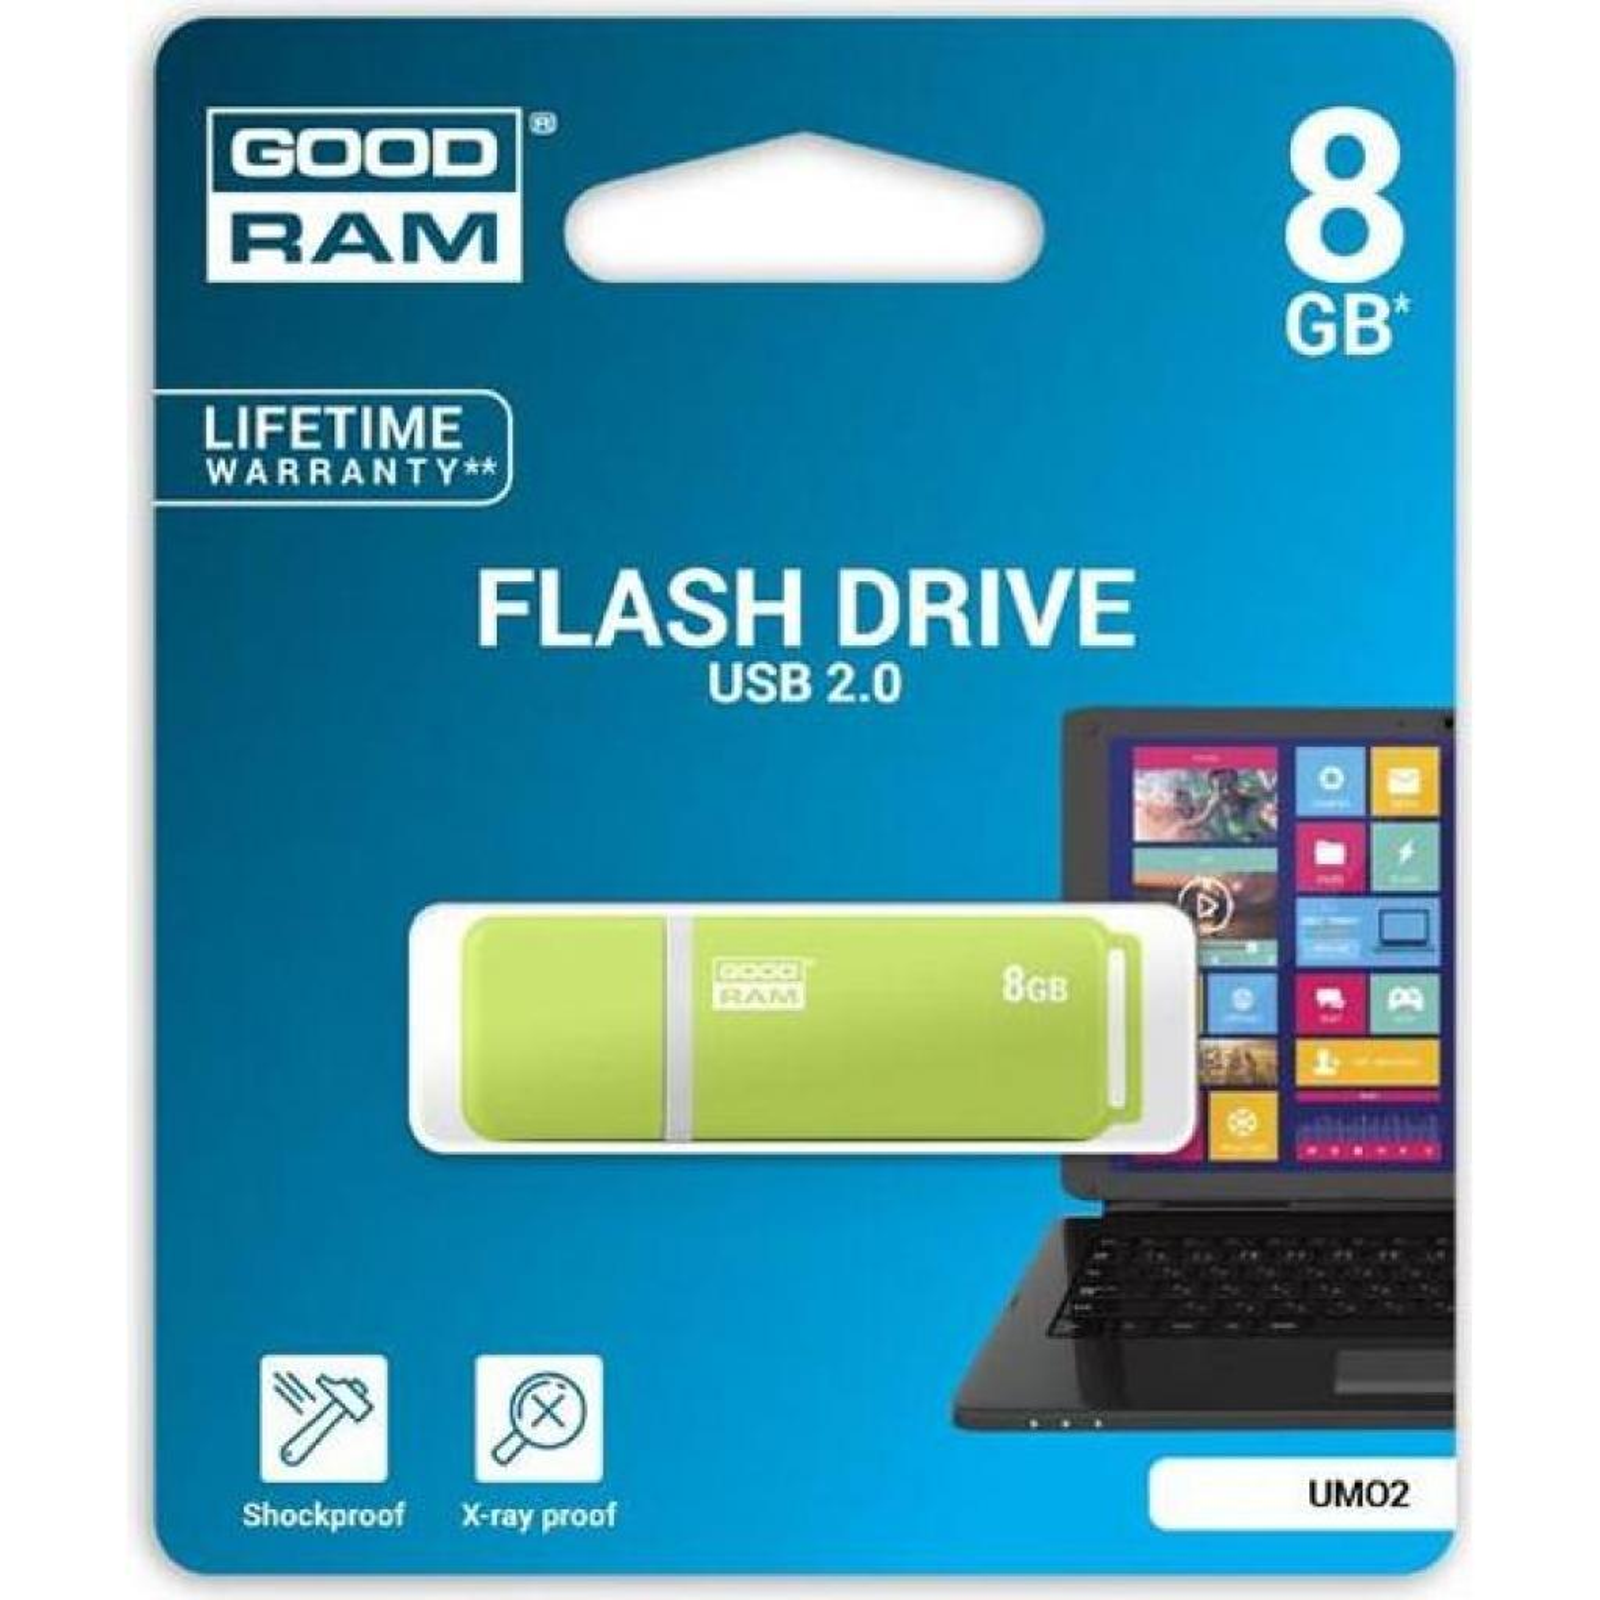 USB флеш накопитель Goodram 8GB UMO2 Green USB 2.0 (UMO2-0080G0R11) изображение 6